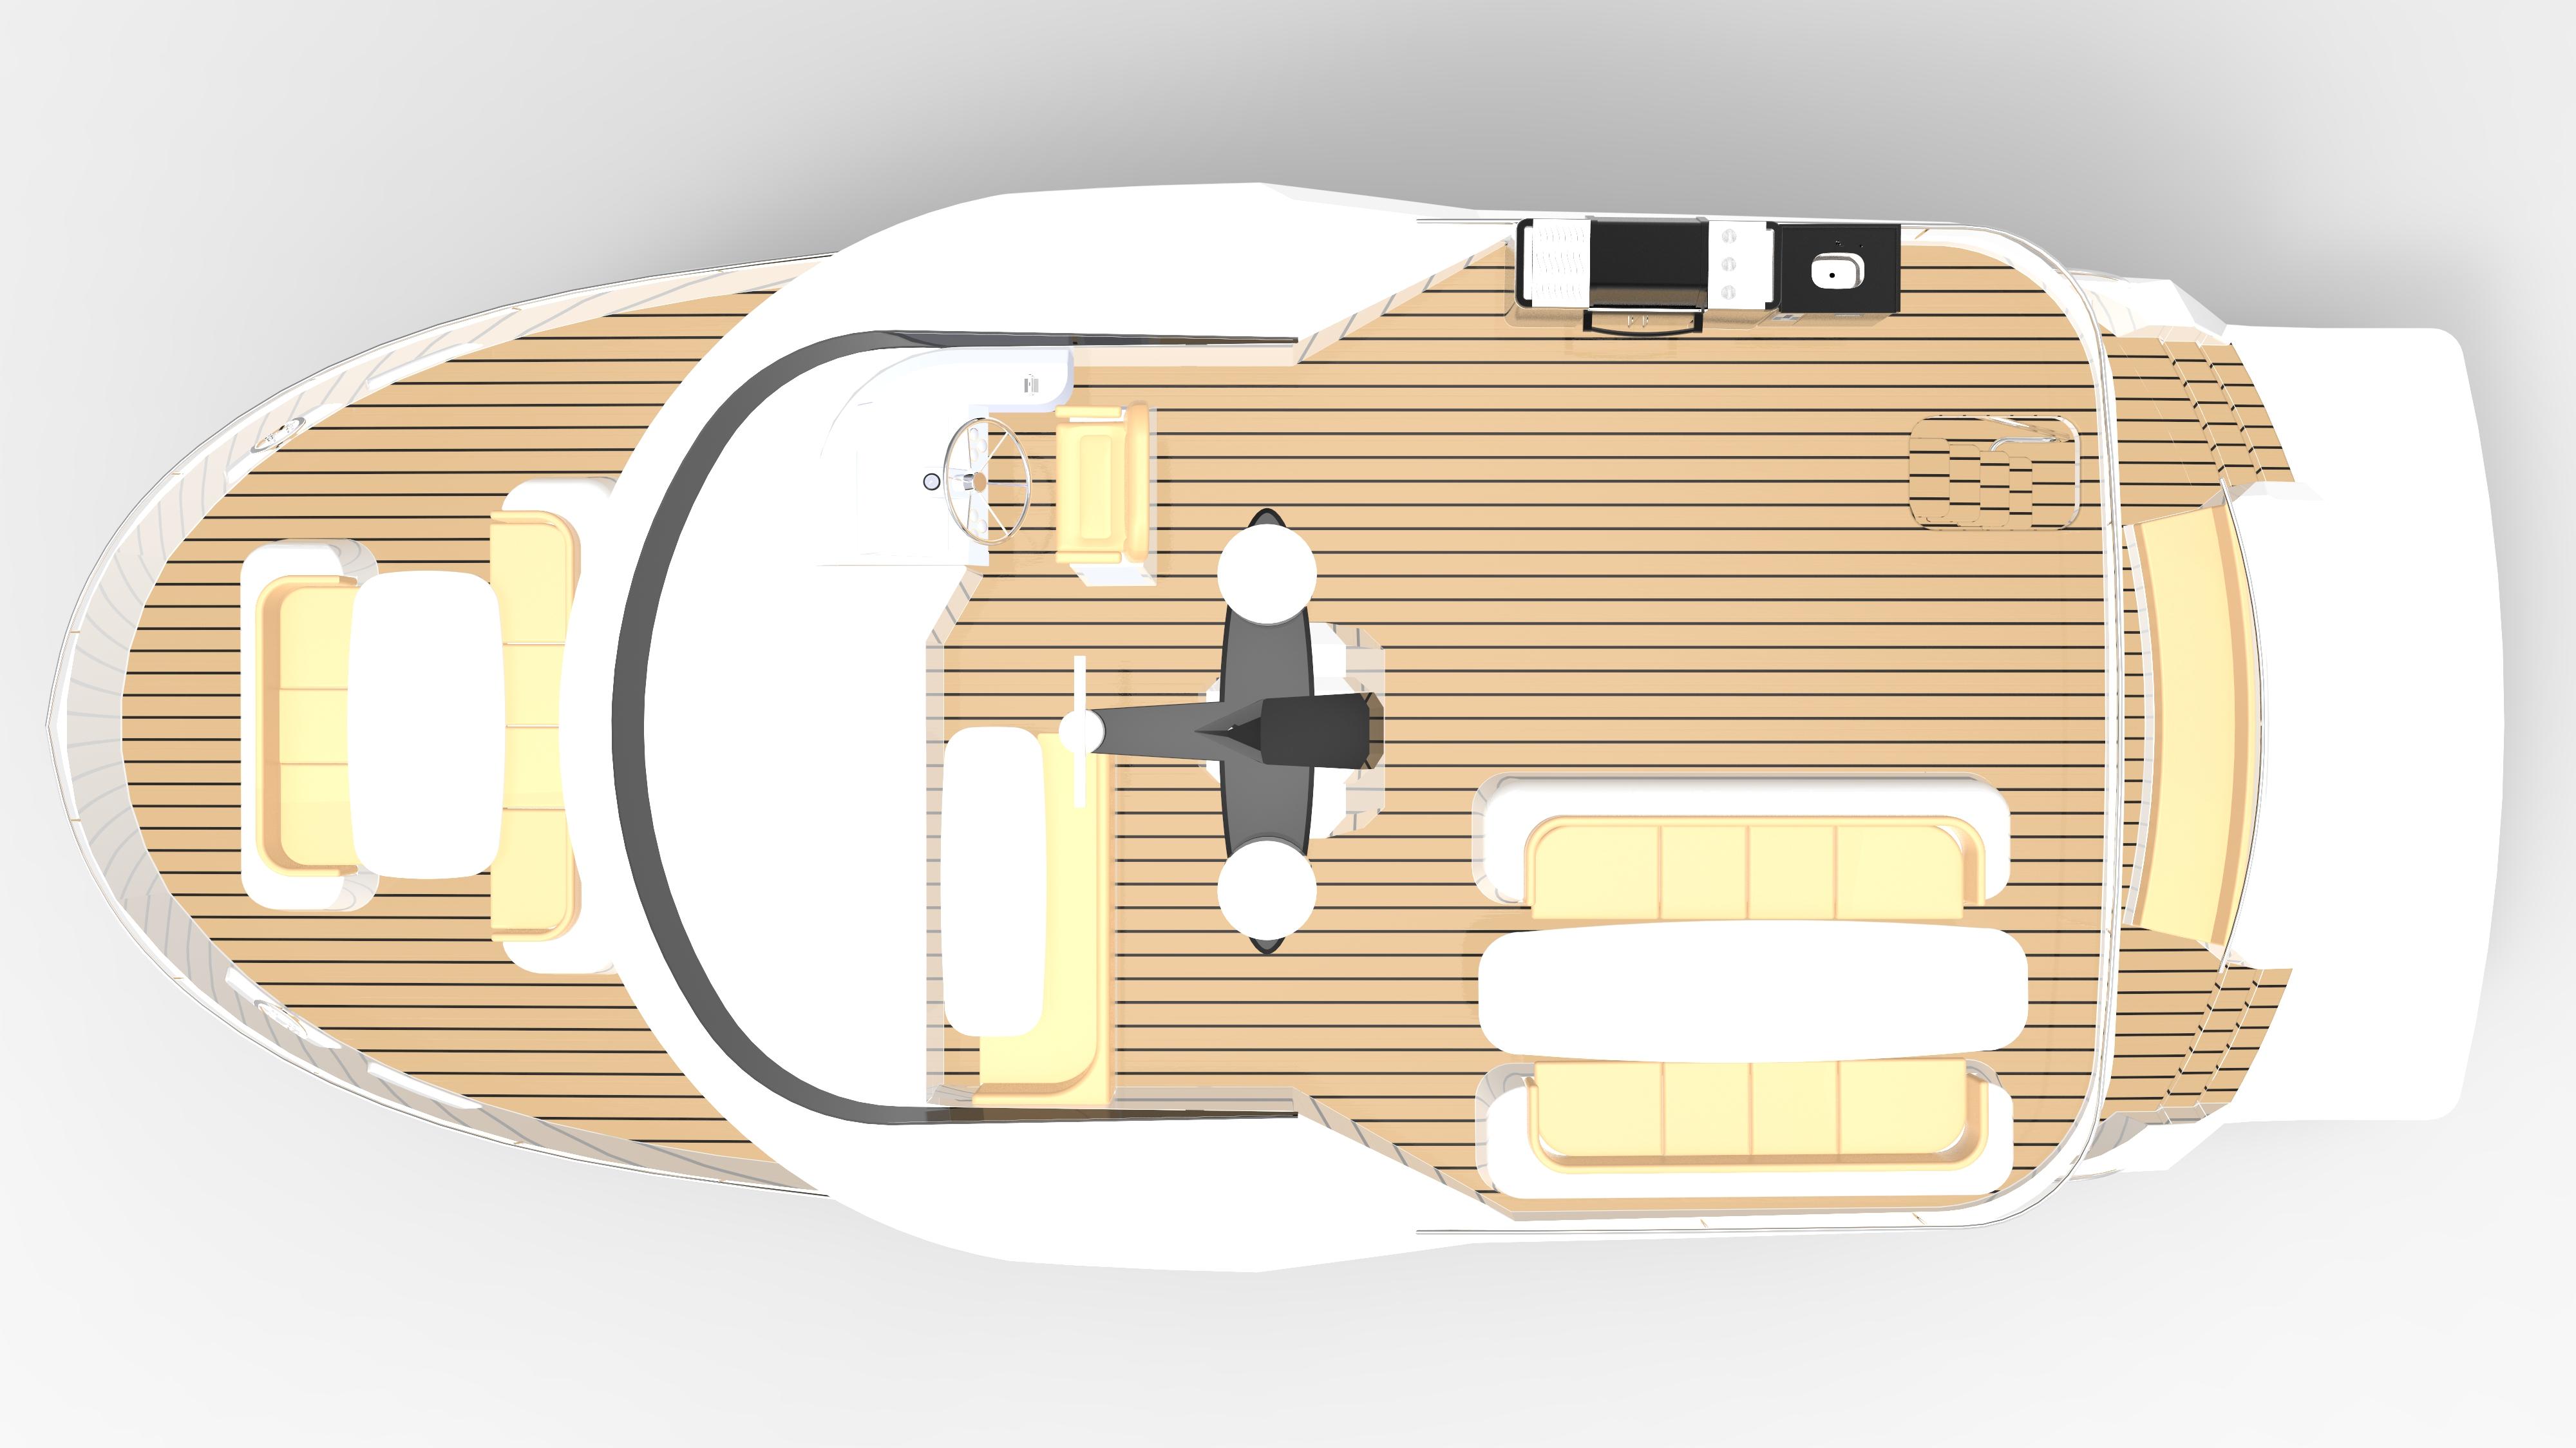 Boat1.33.jpg